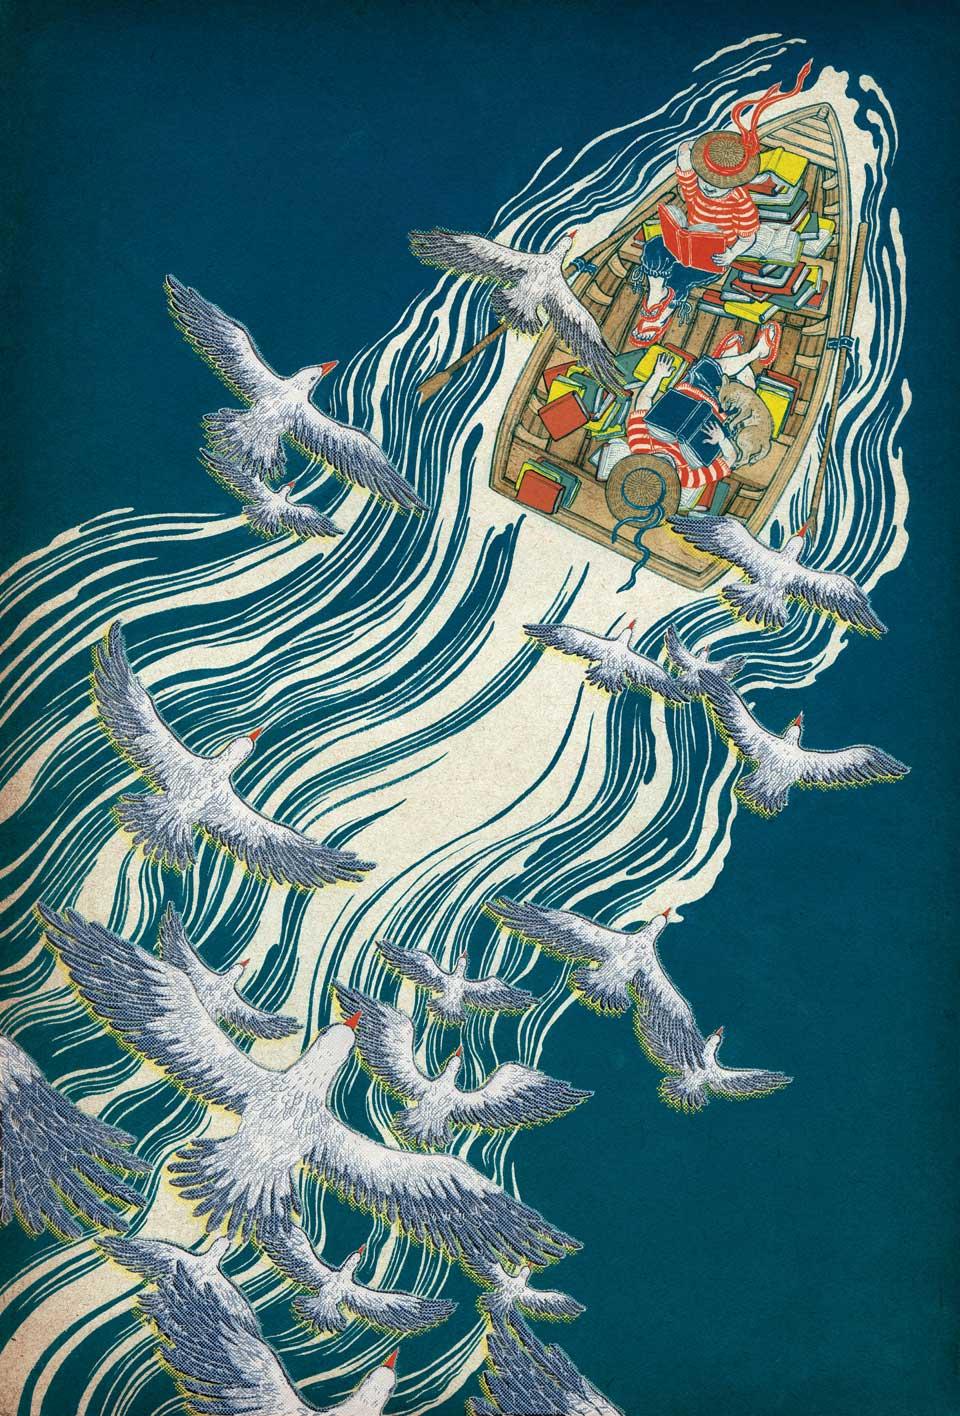 Yuko Shimizu - Library of Congress National Book Festival 2016 key visual -